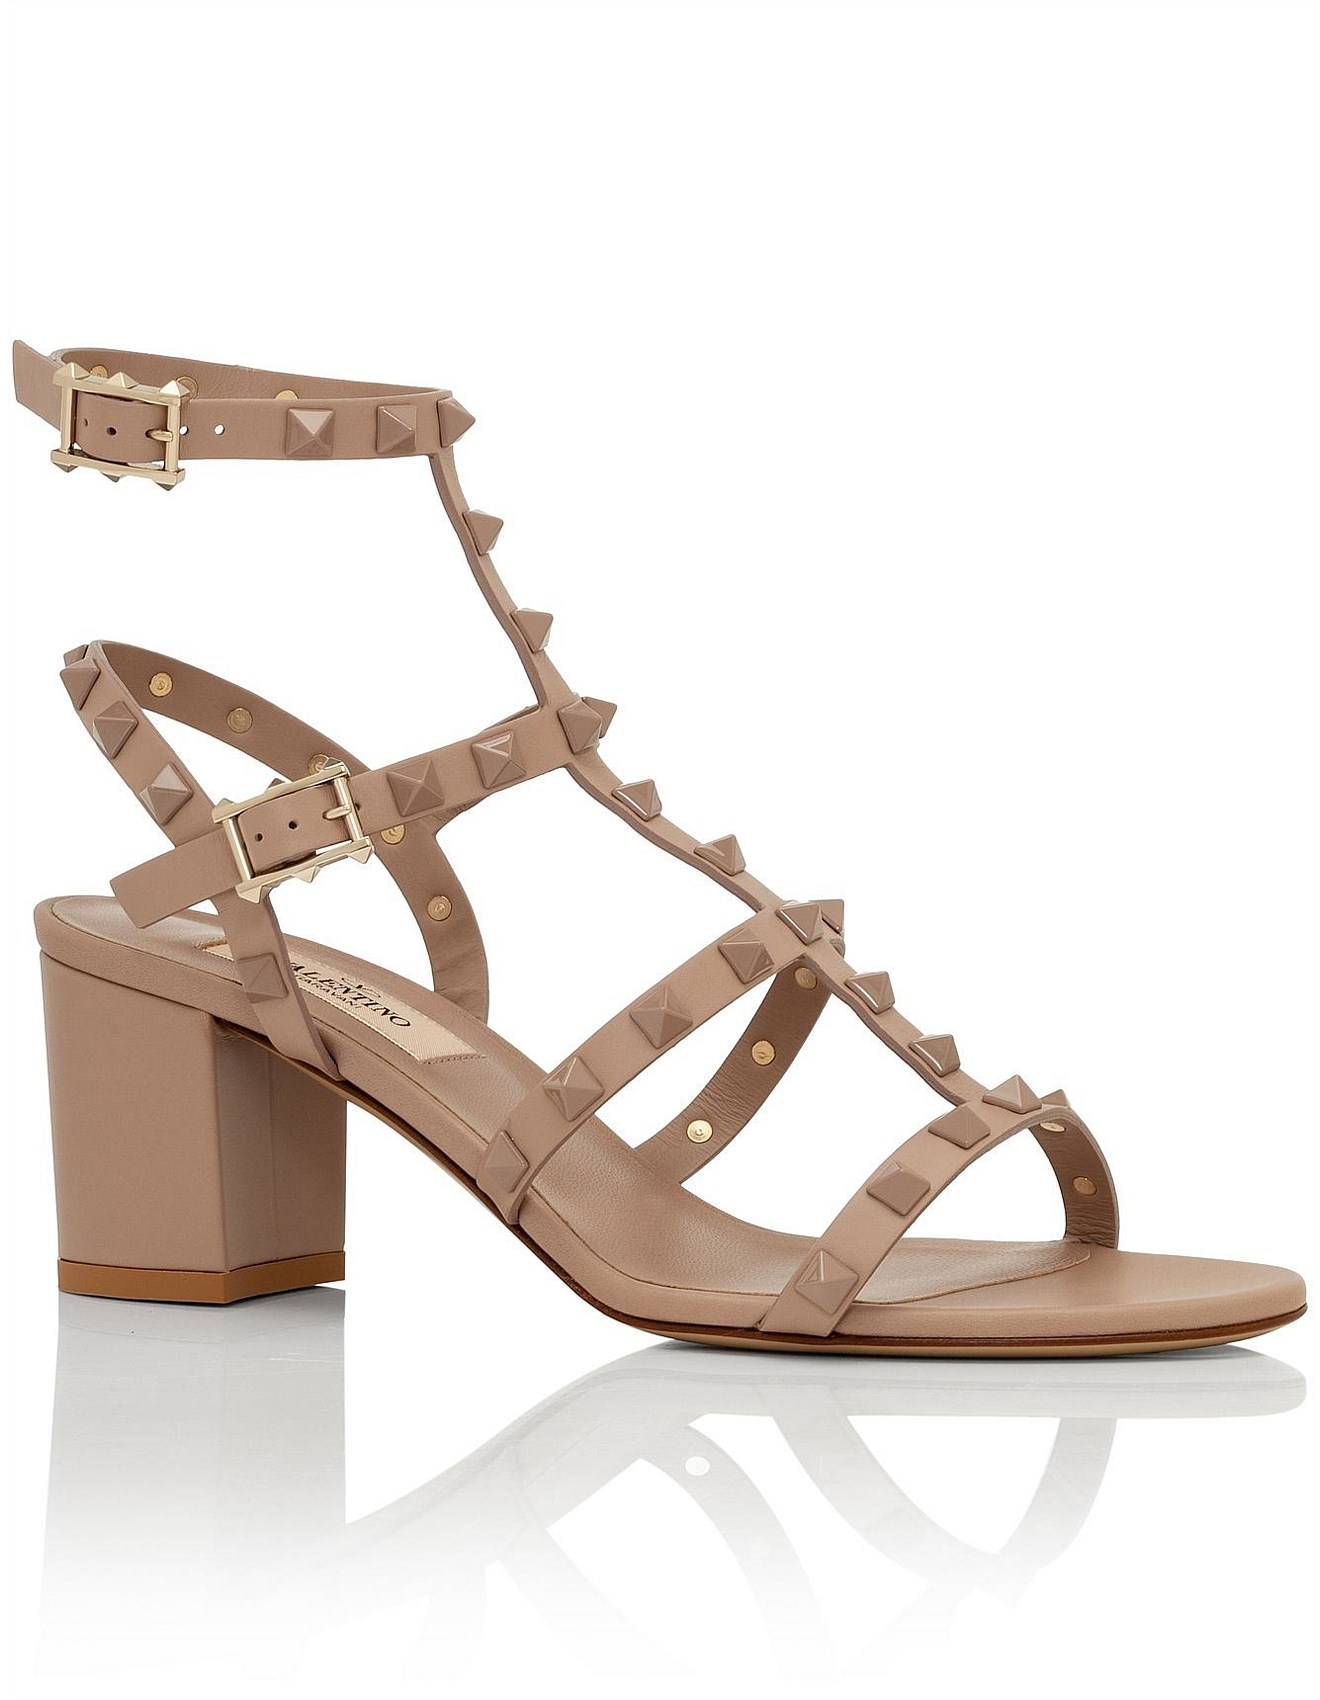 92ce3a9f27a8 Sandals   Thongs - ROCKSTUD 60 LACQUER STUD BLOCK SANDAL